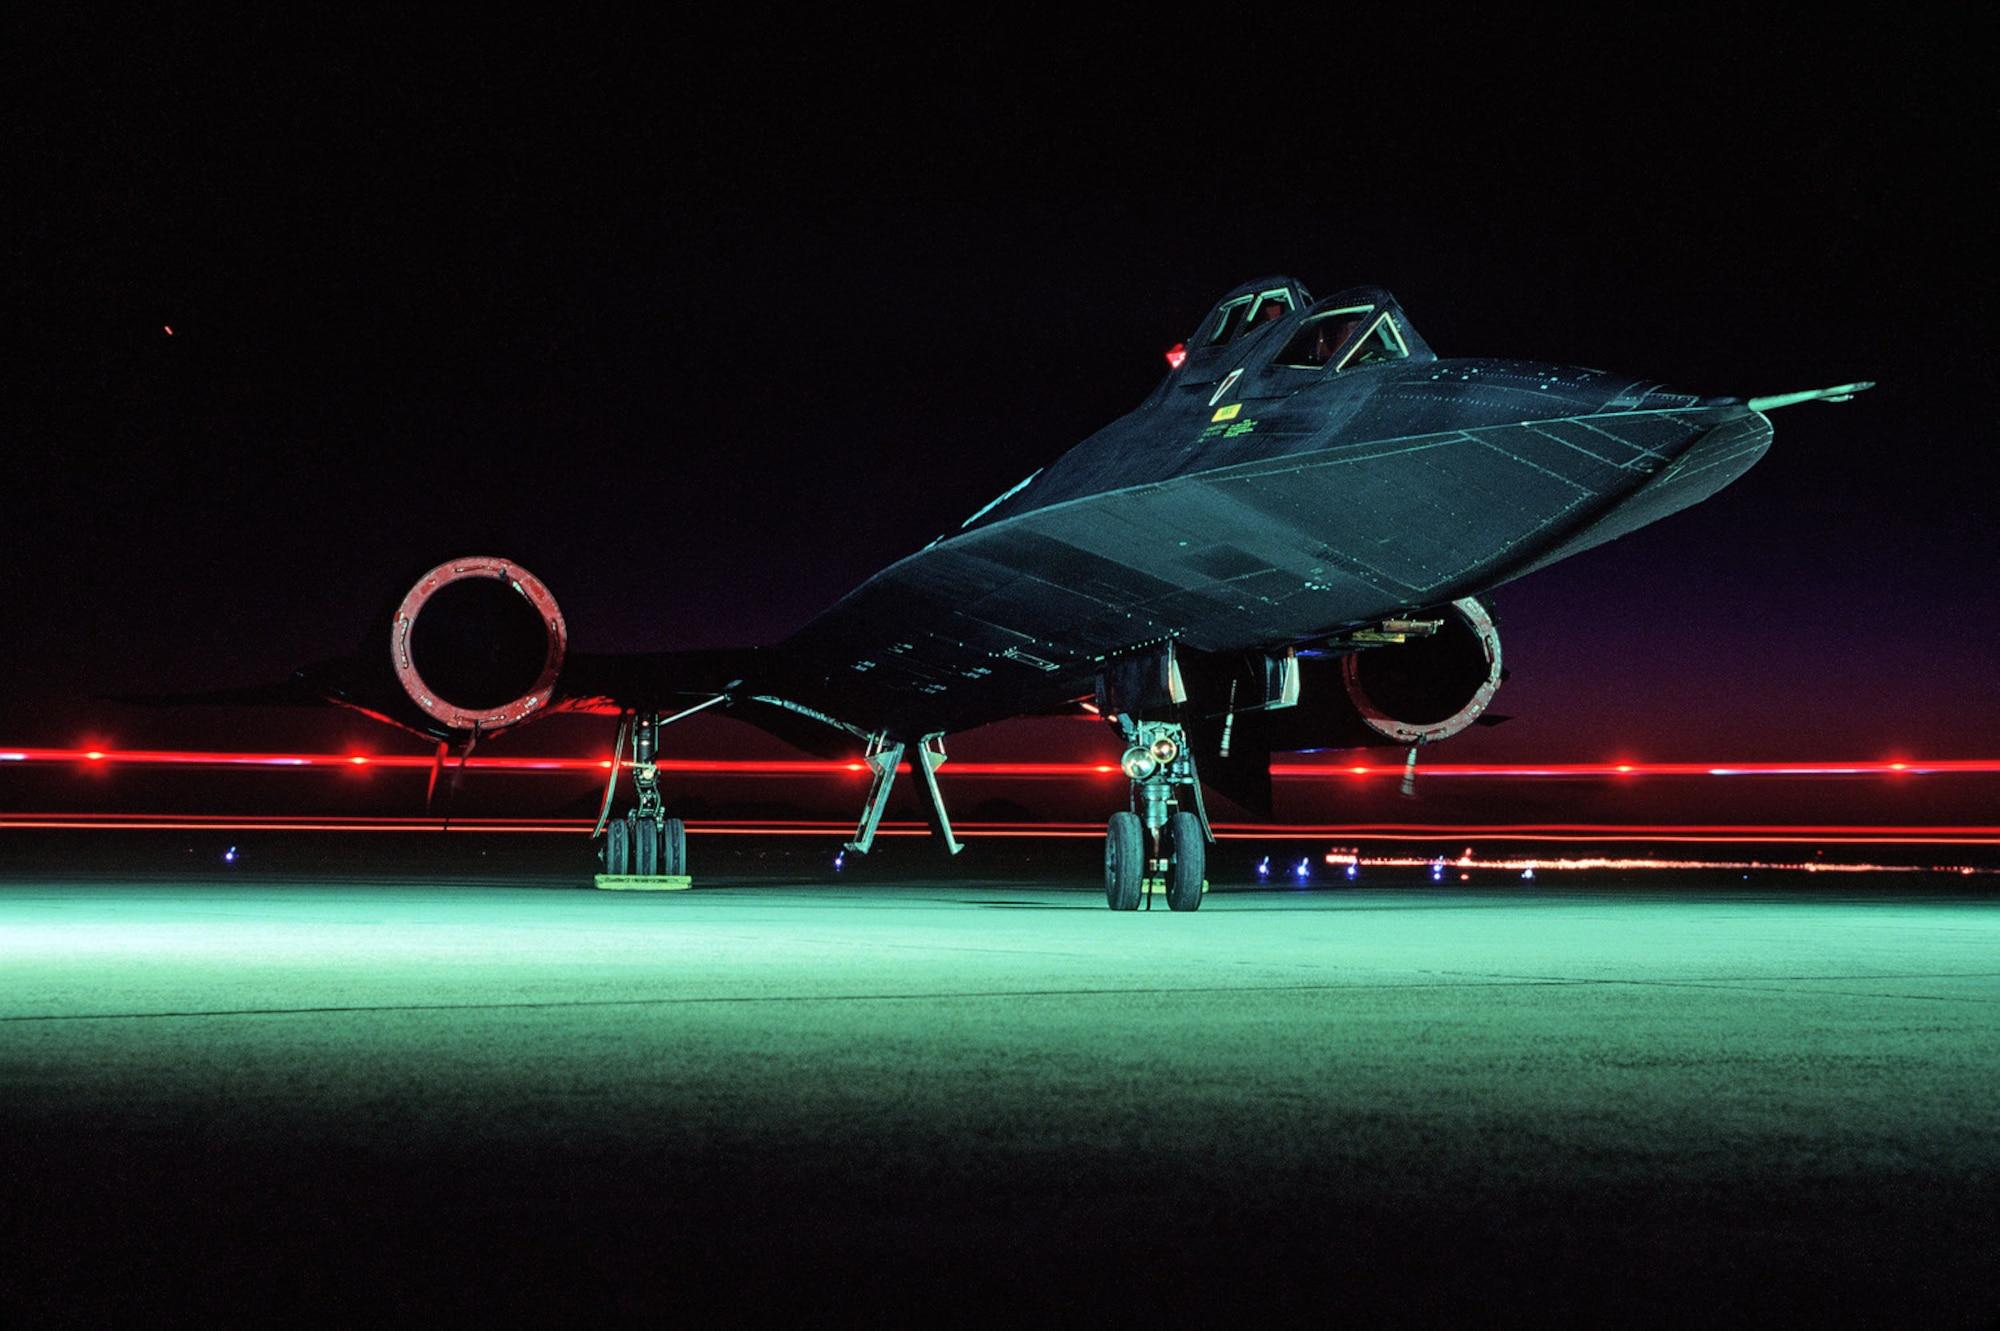 An SR-71B Blackbird sits on the runway after sundown. (Courtesy photo)